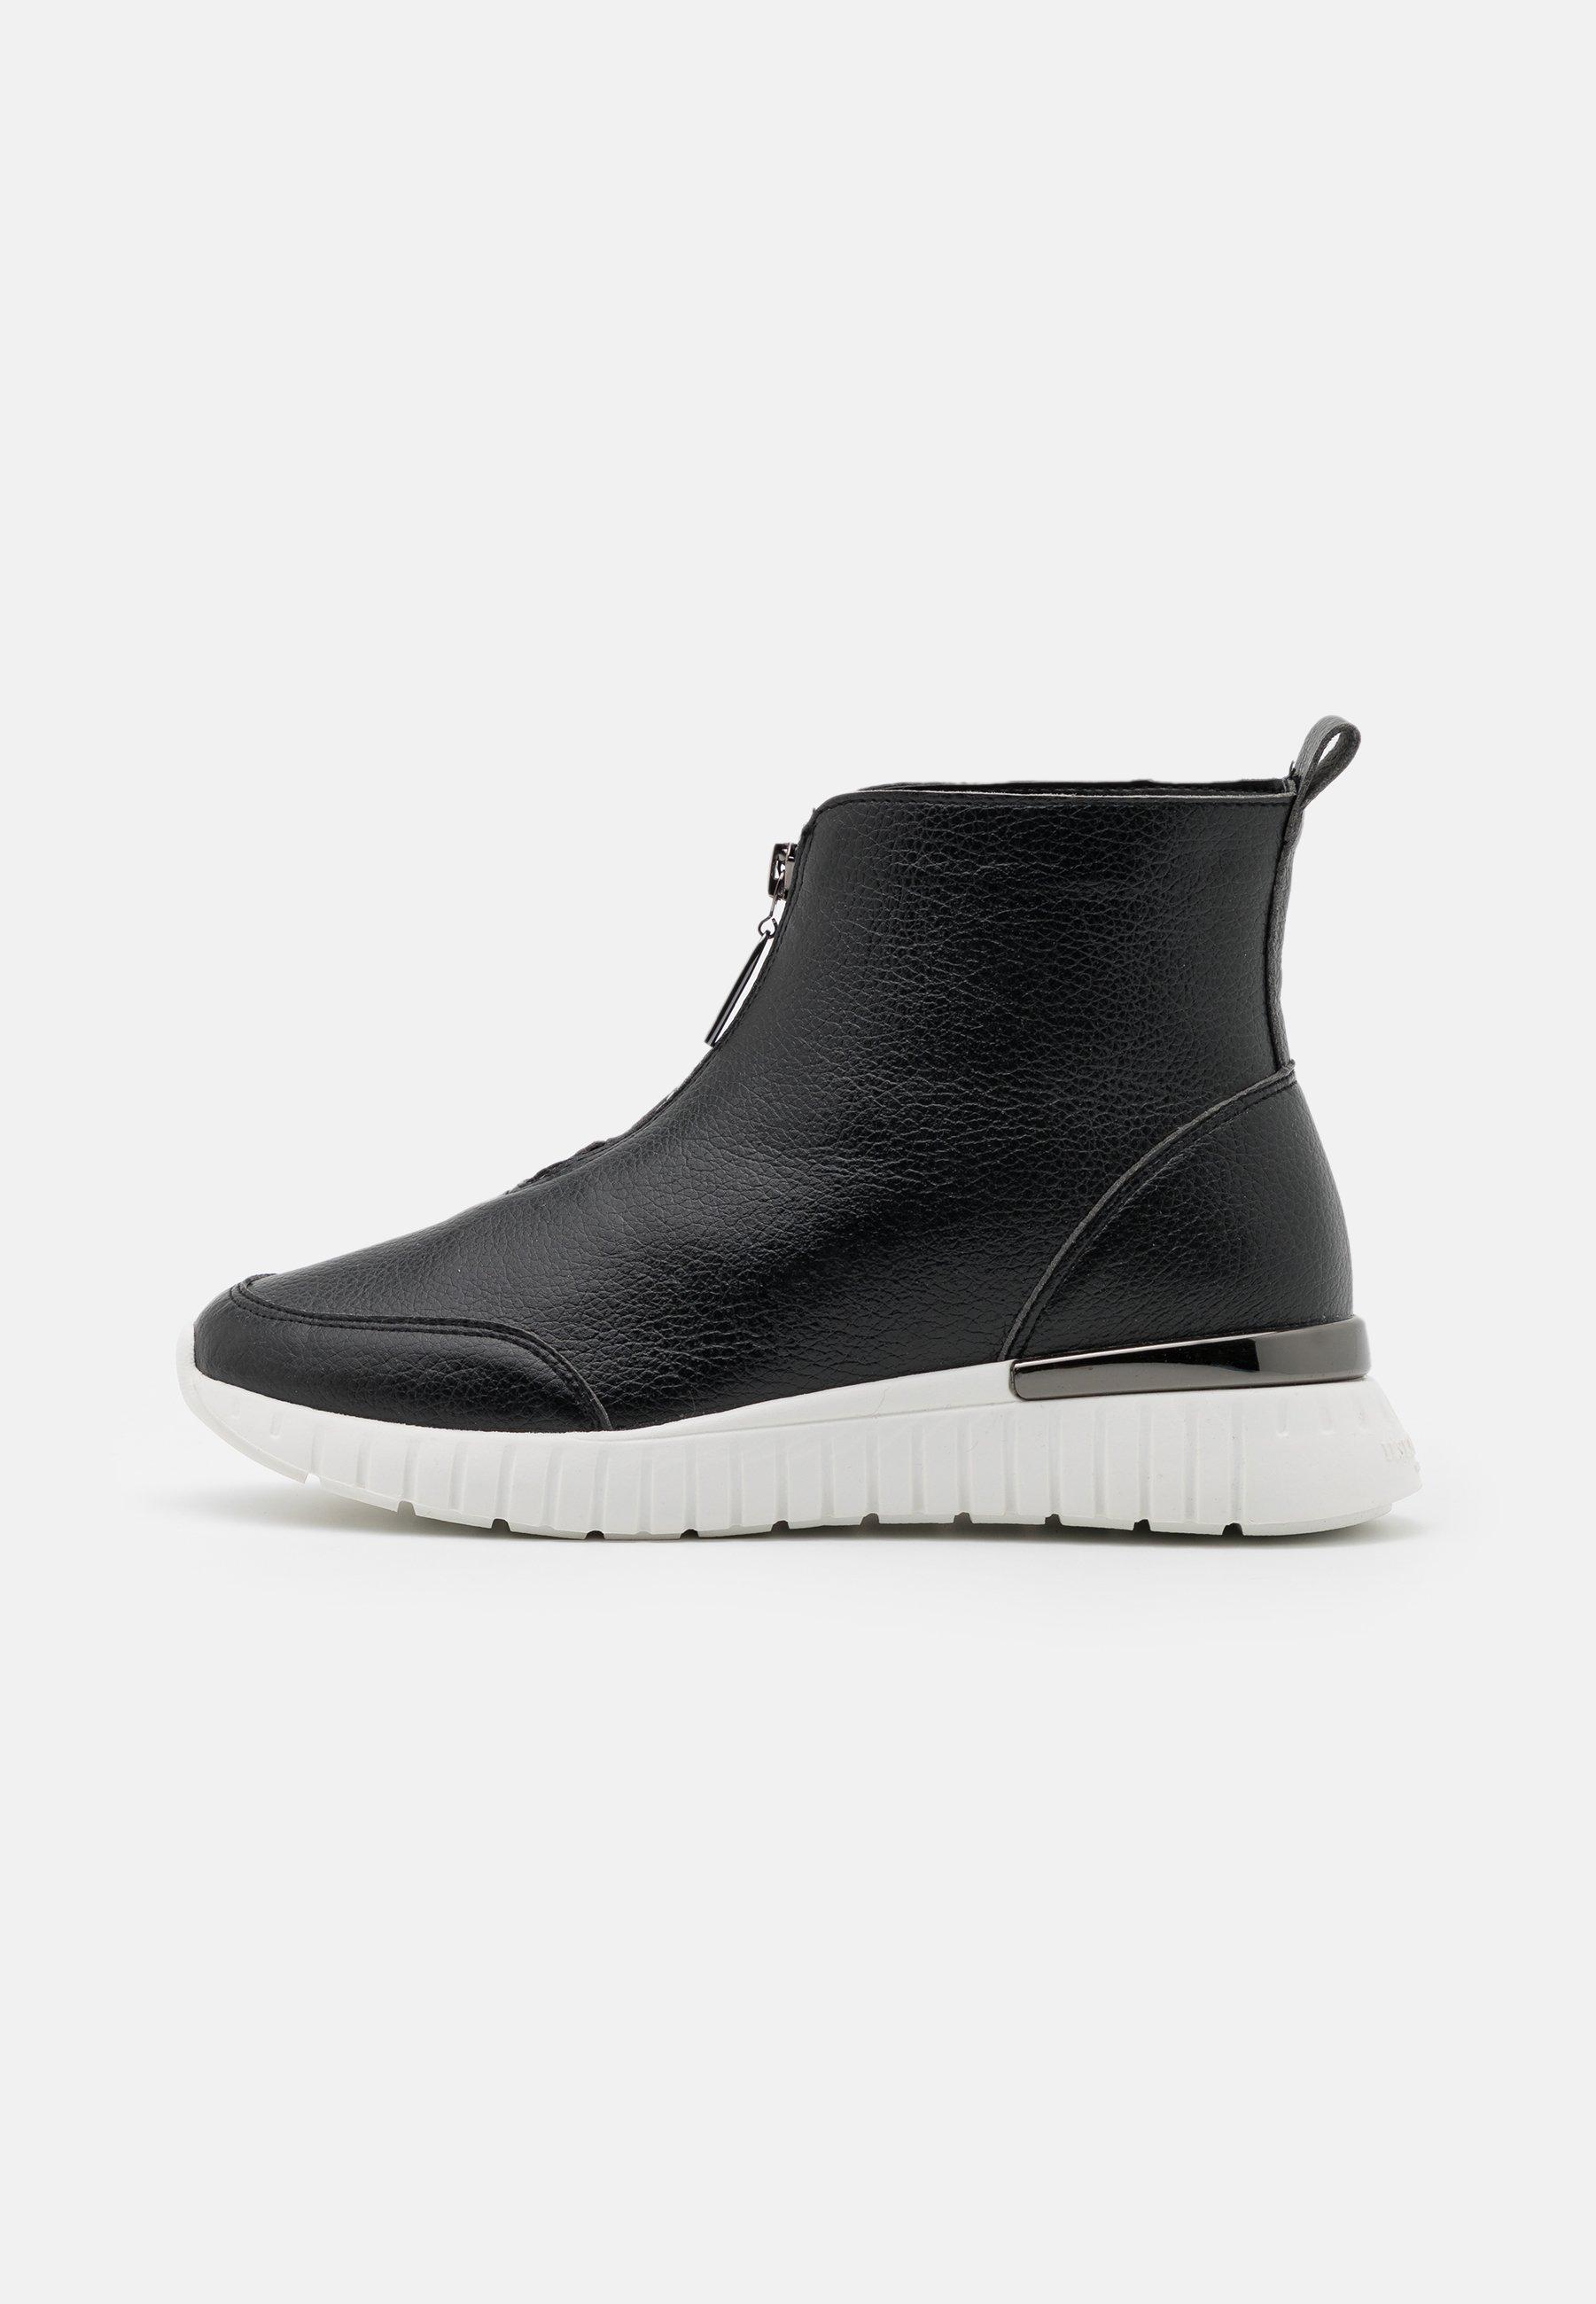 Köp Ilse Jacobsen 34 Rubber Boots Platin Skor Online